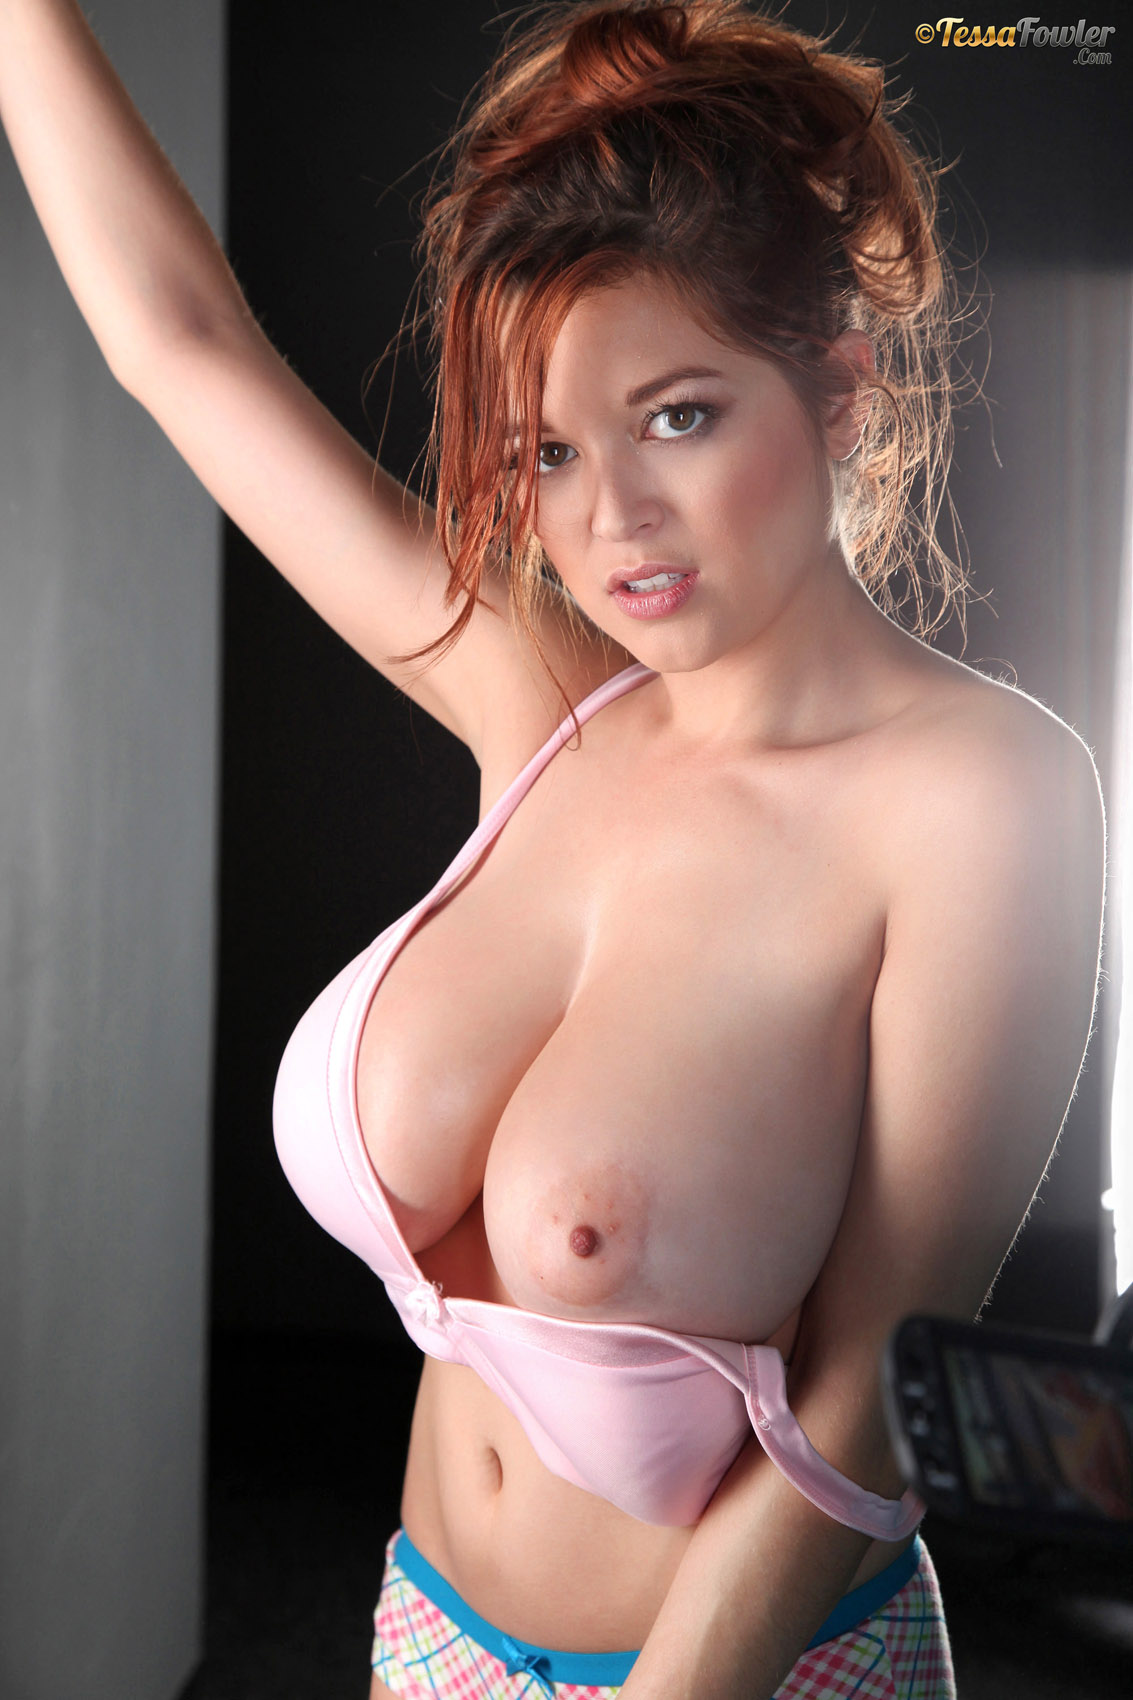 Hot trisha krishnan sexy bikini bra naval boobs cleavage pics images